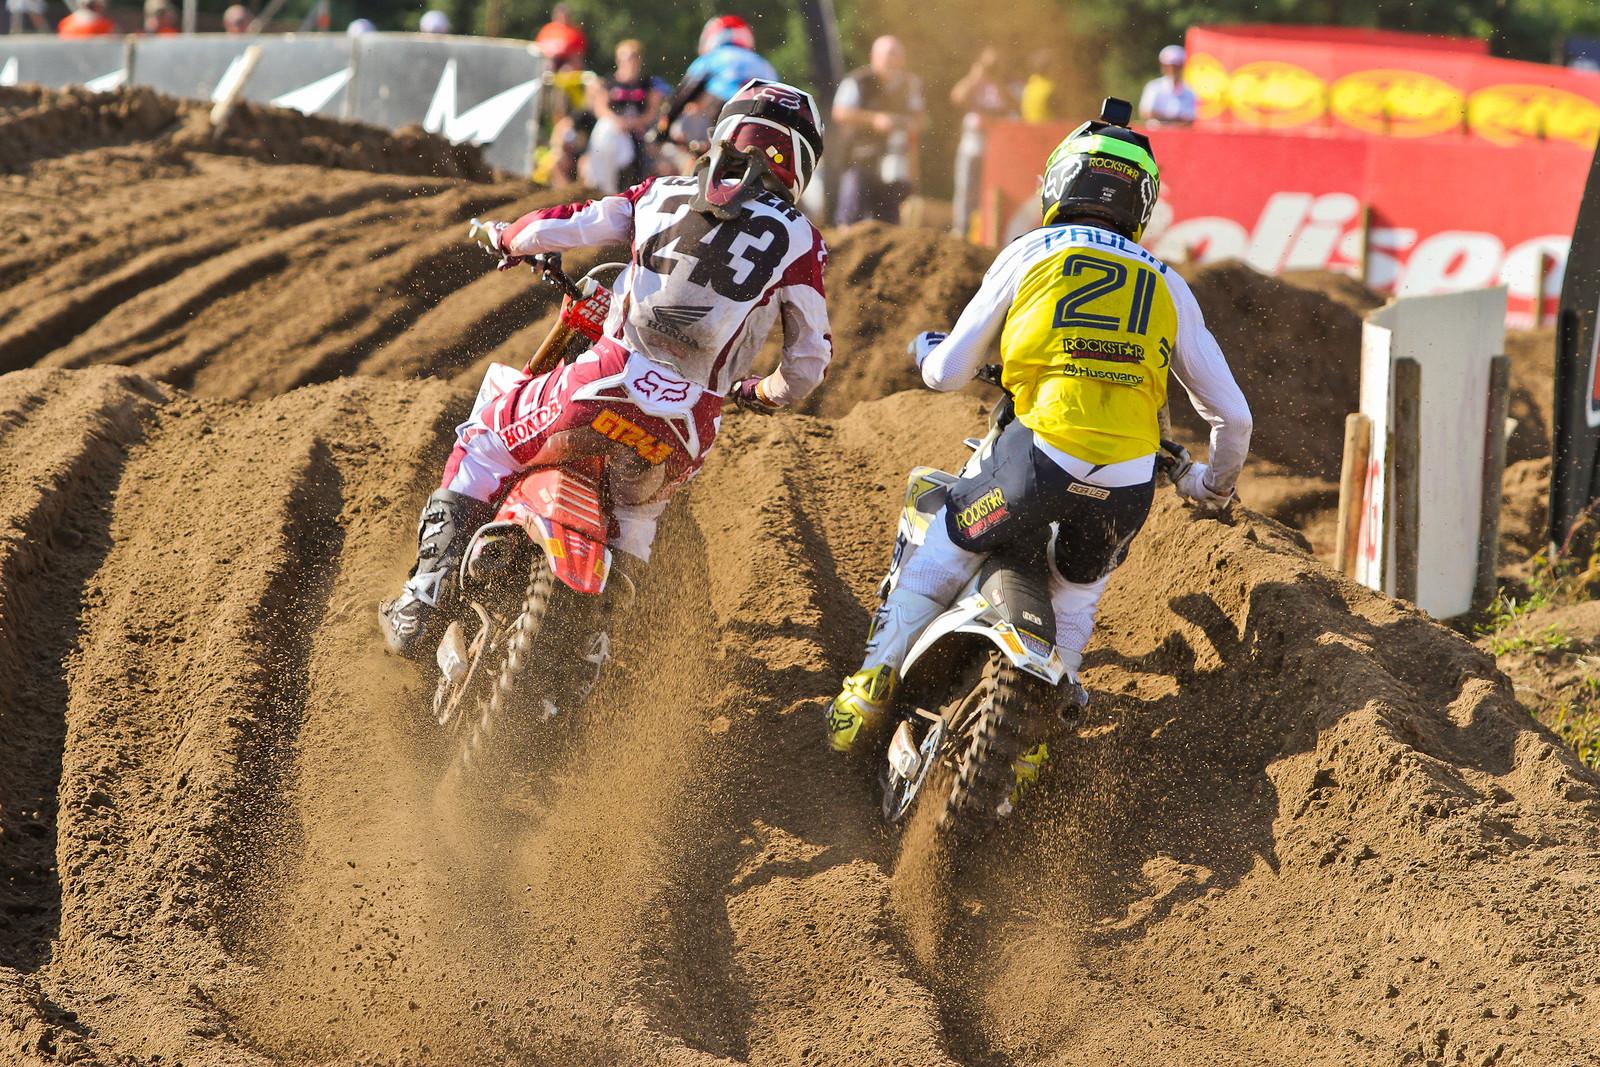 Tim Gajser / Gautier Paulin - ayearinmx - Motocross Pictures - Vital MX